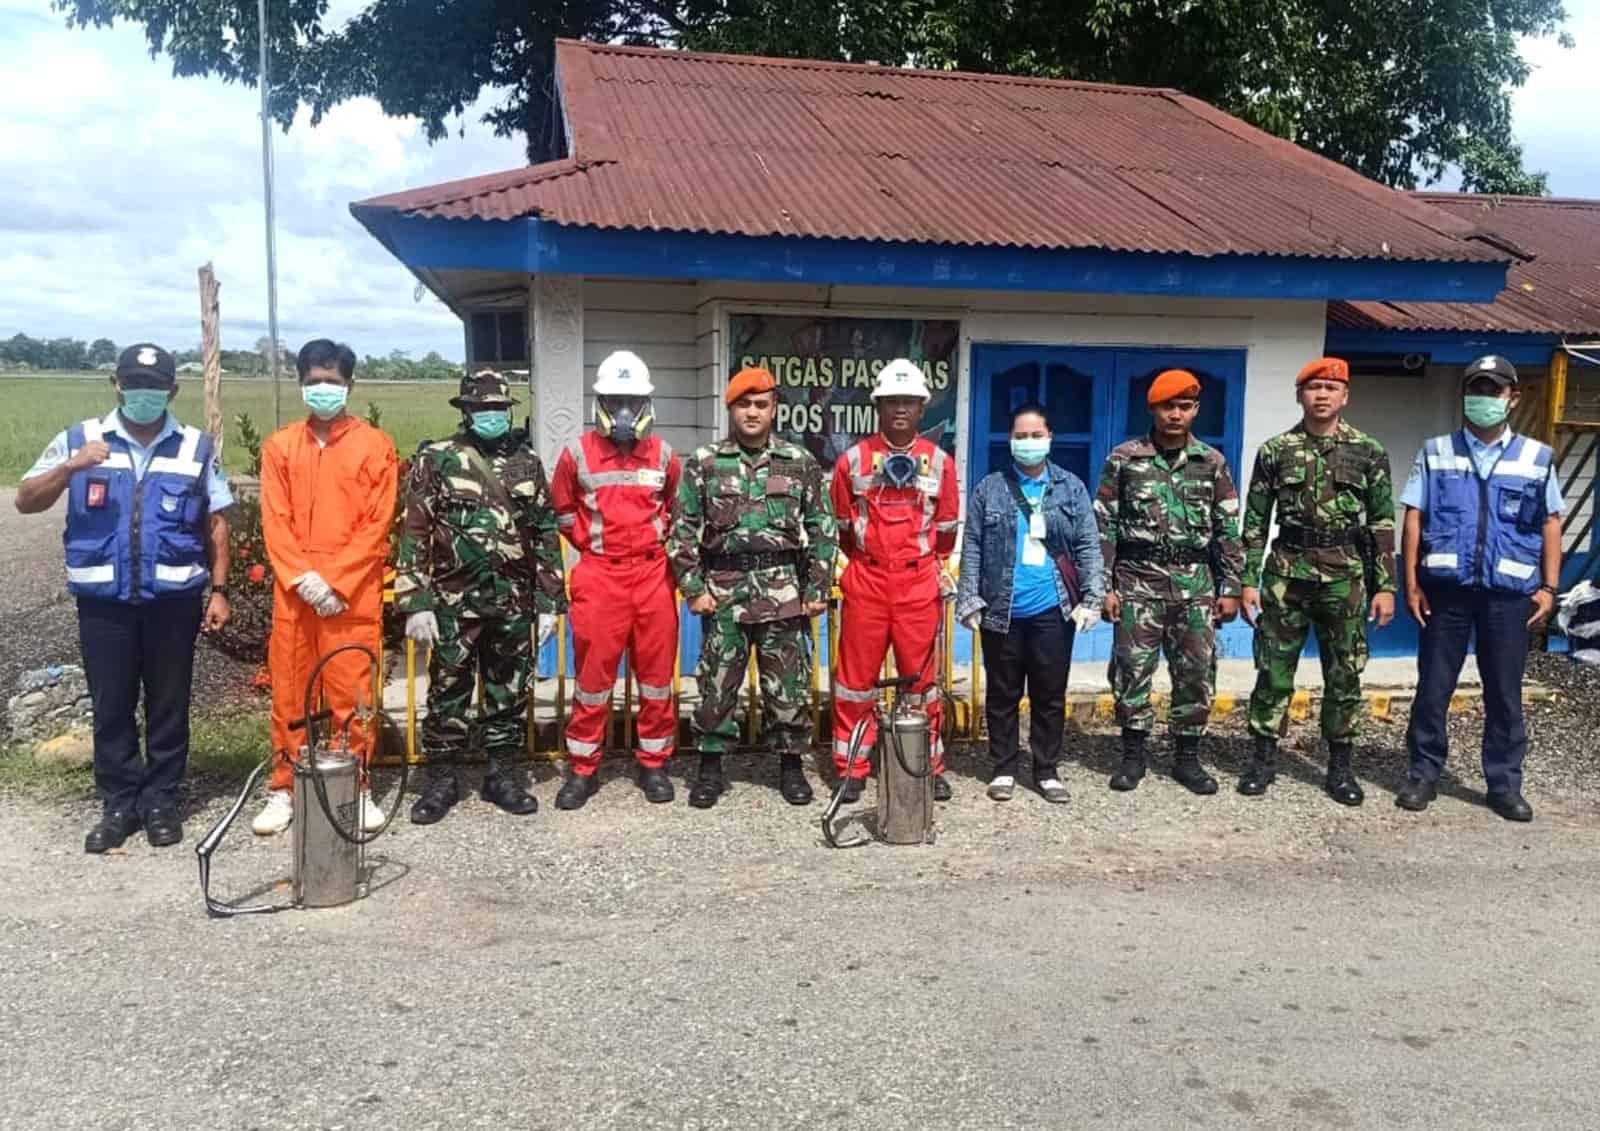 Satgas Pamrahwan Yonko 462 Paskhas Pos Timika Laksanakan penyemprotan Disinfektan